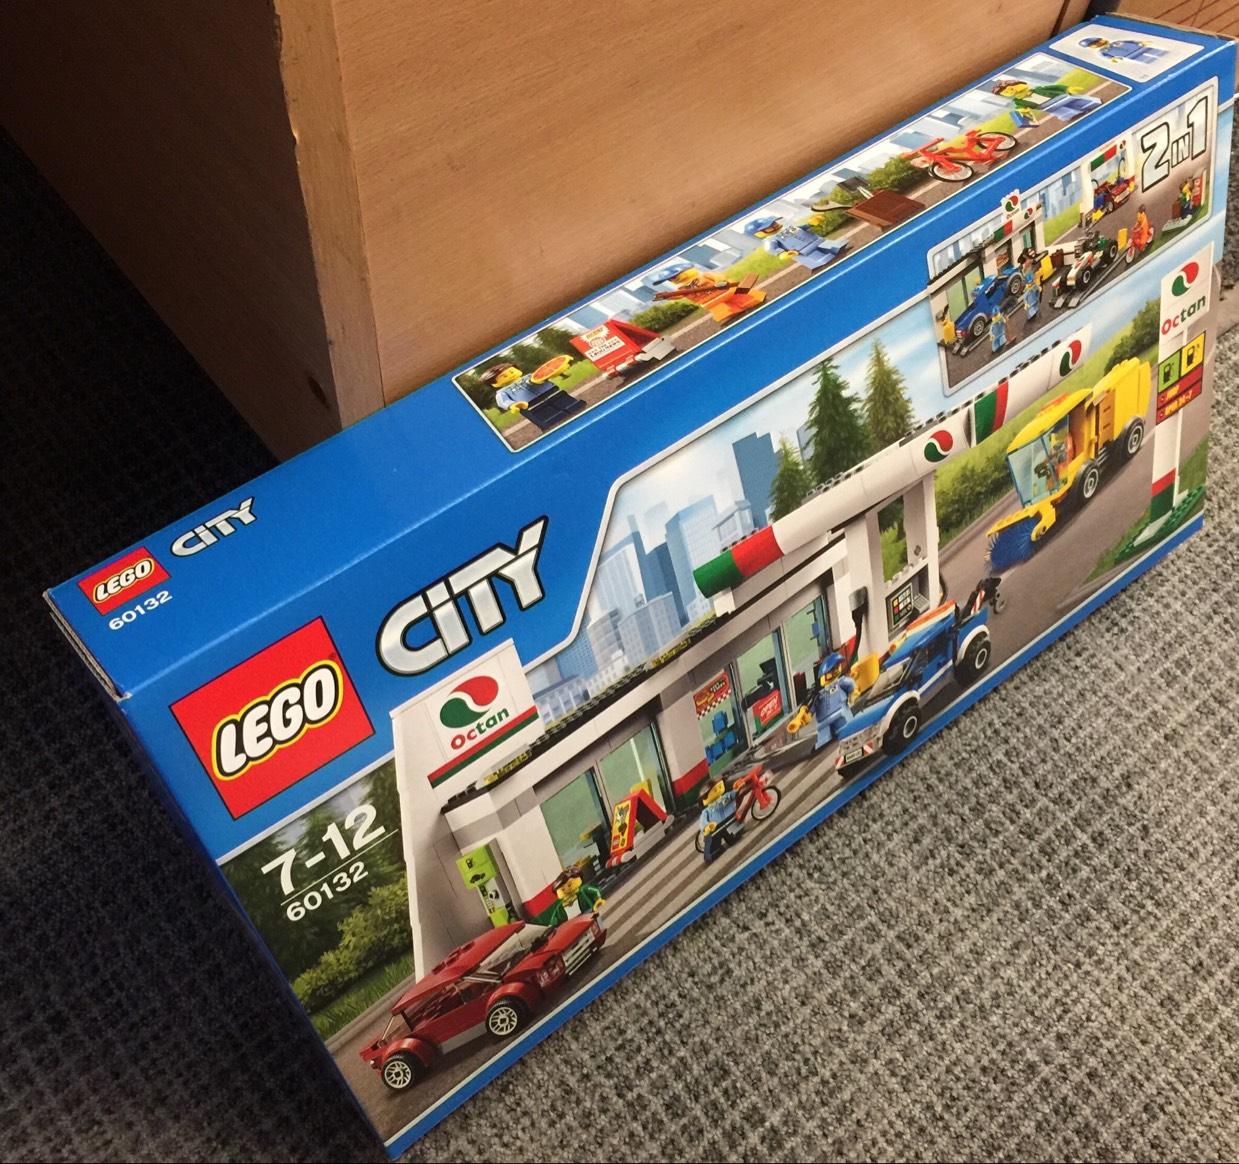 LEGO 60132 City Service Station £32.49 @ Argos - HotUKDeals